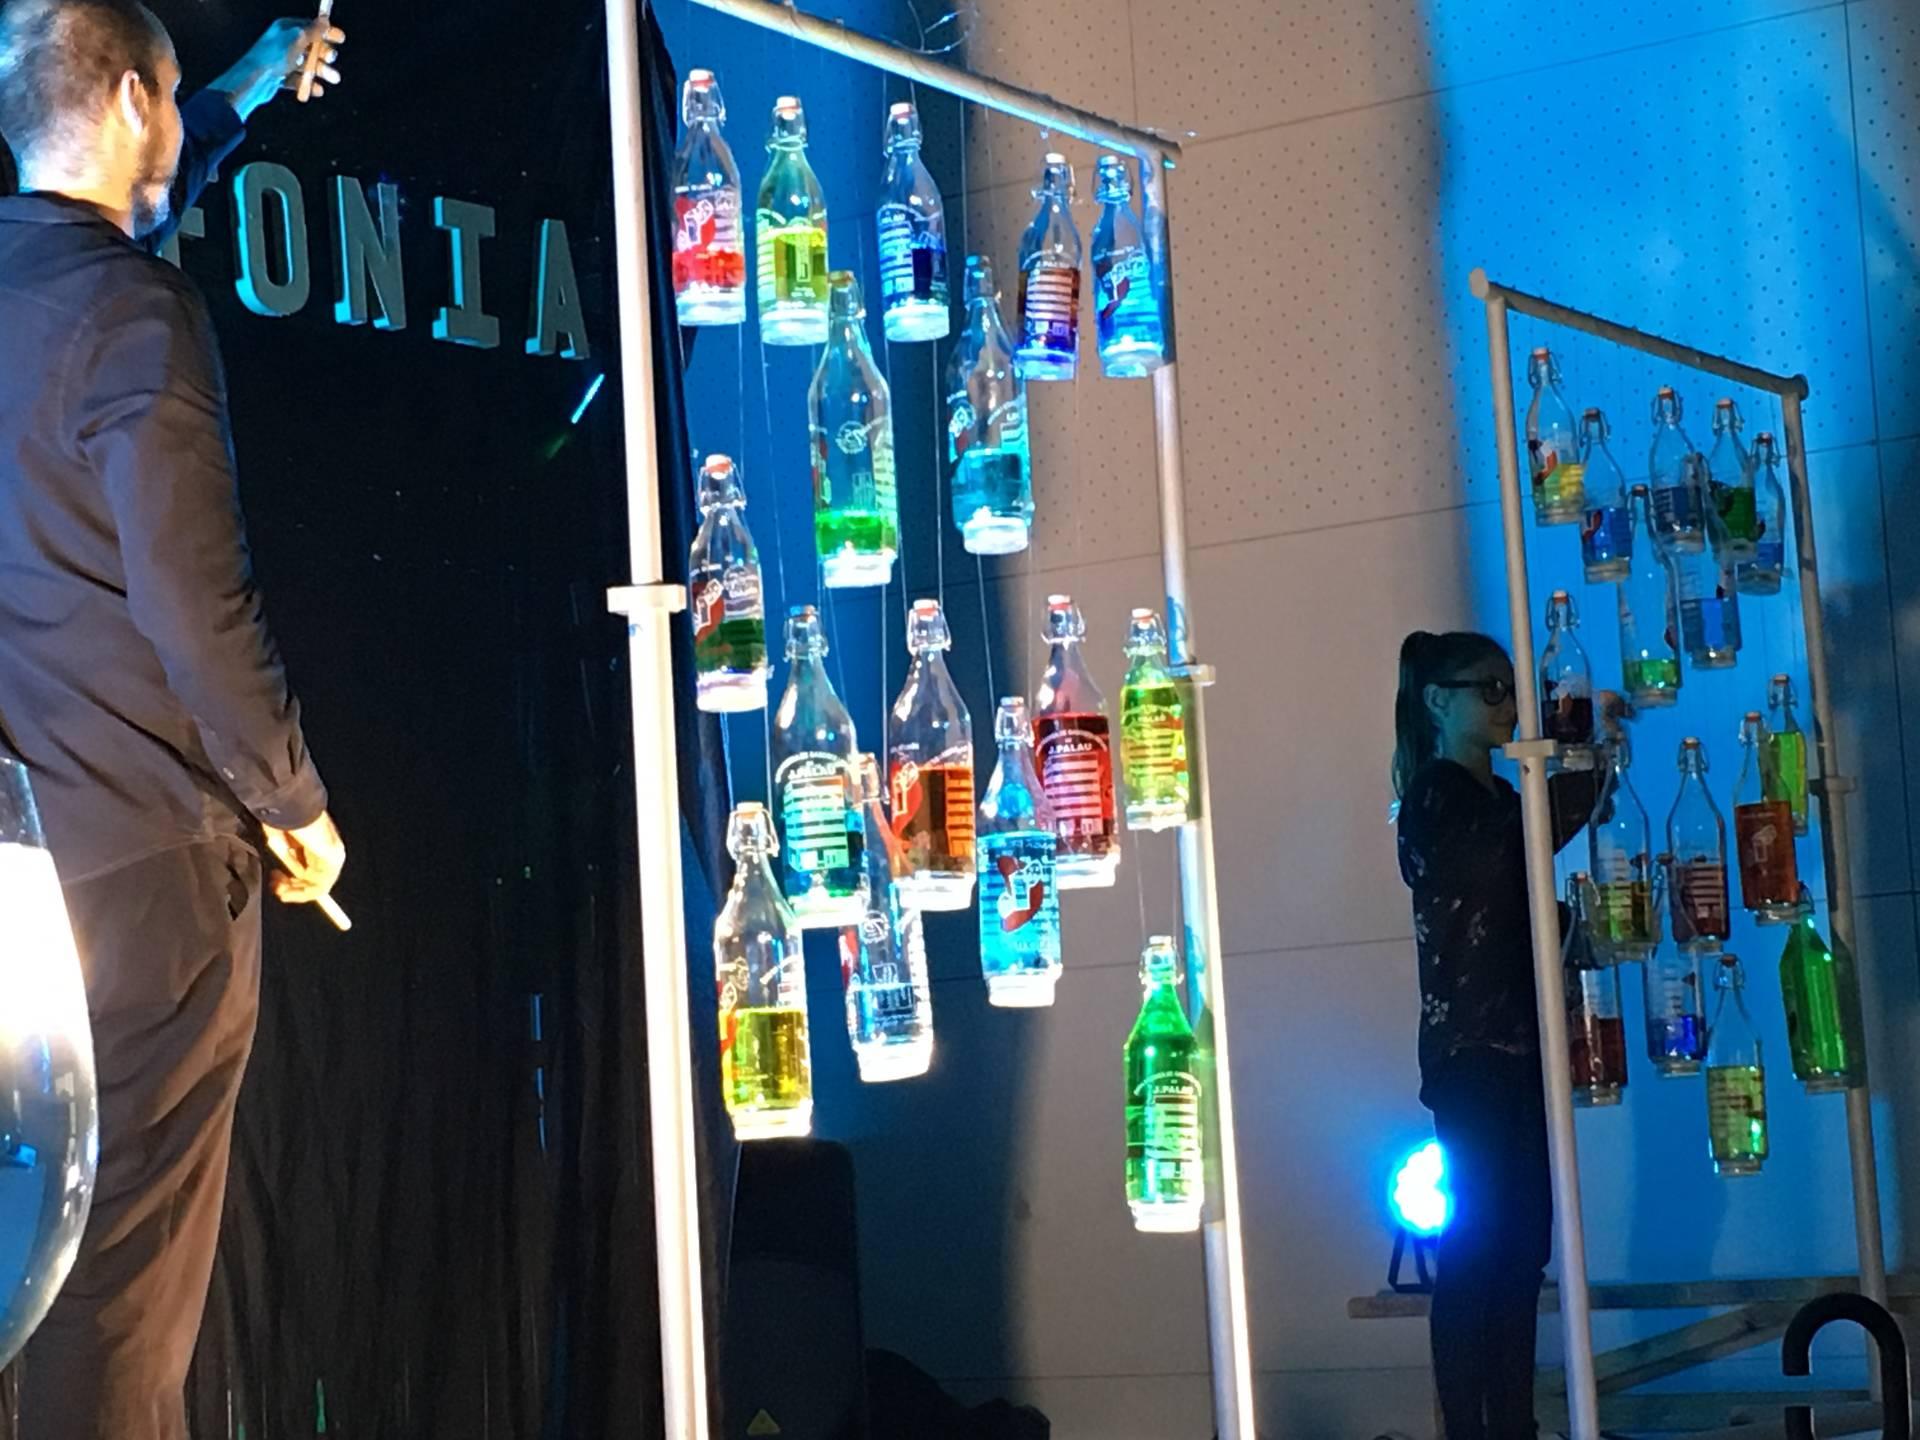 Espectáculo musical 'Aquafonia' en Espai Putxet (Barcelona)